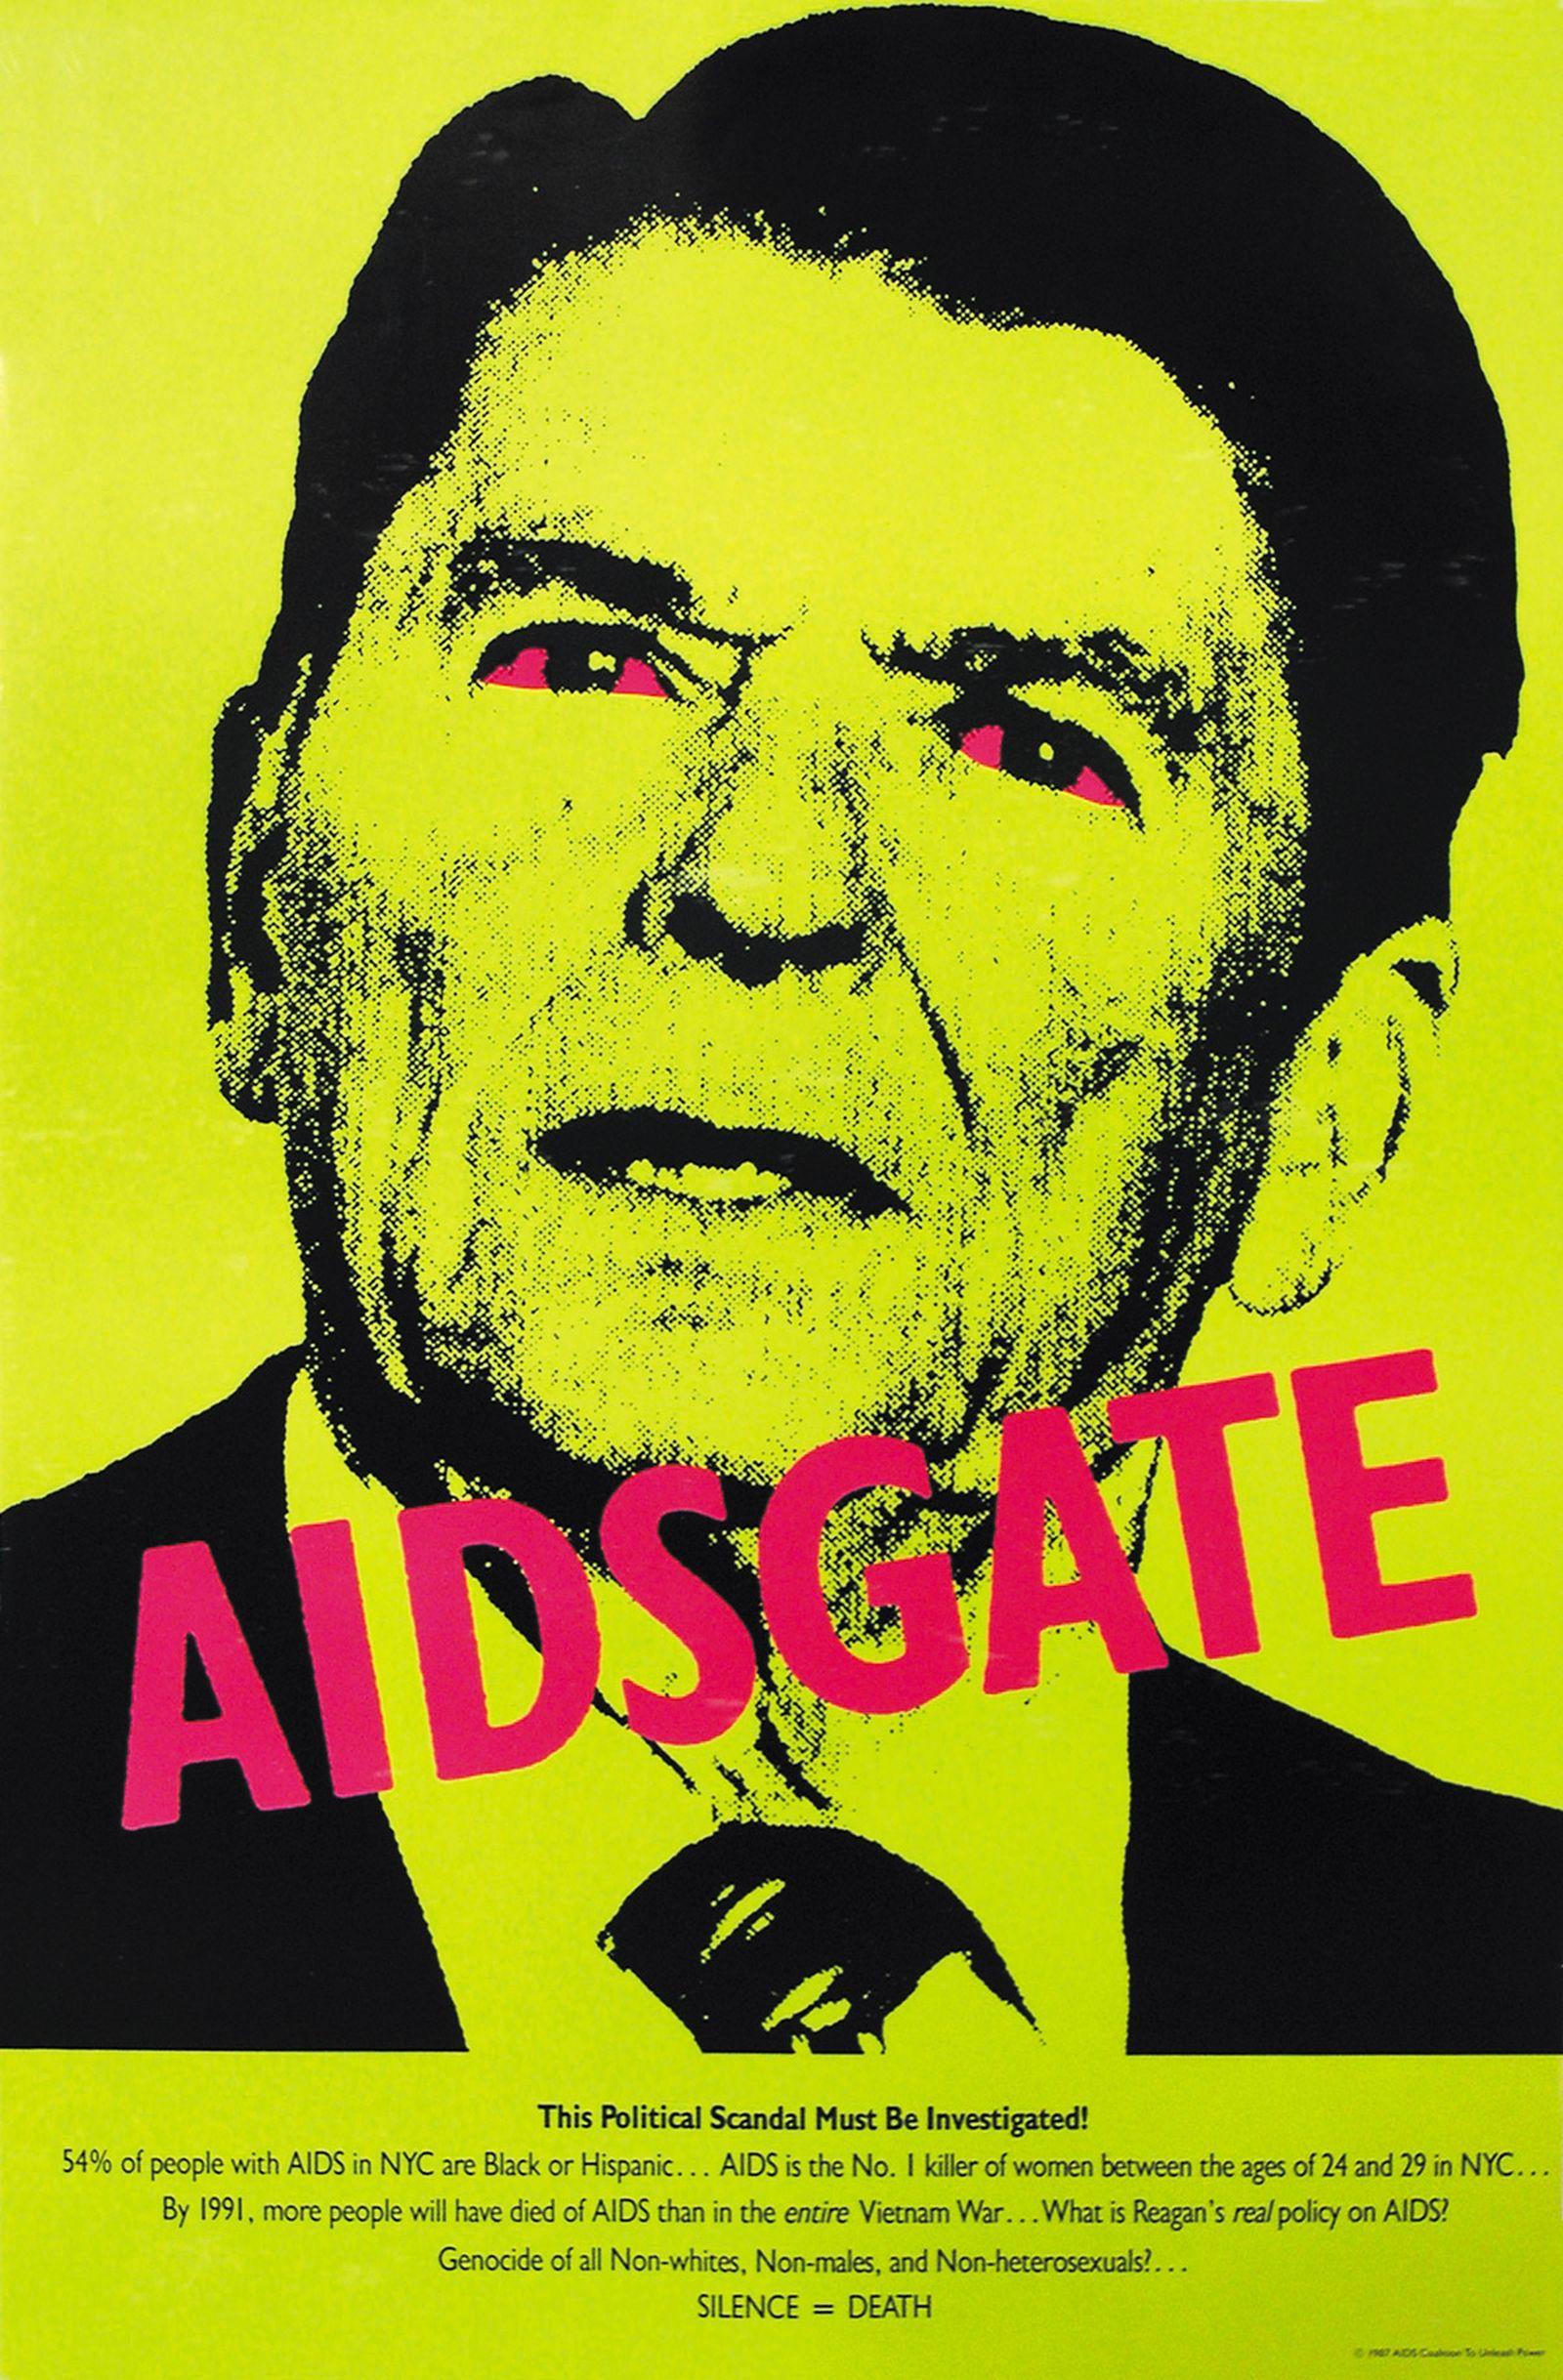 Silence = Death Project, AIDSGATE, 1987